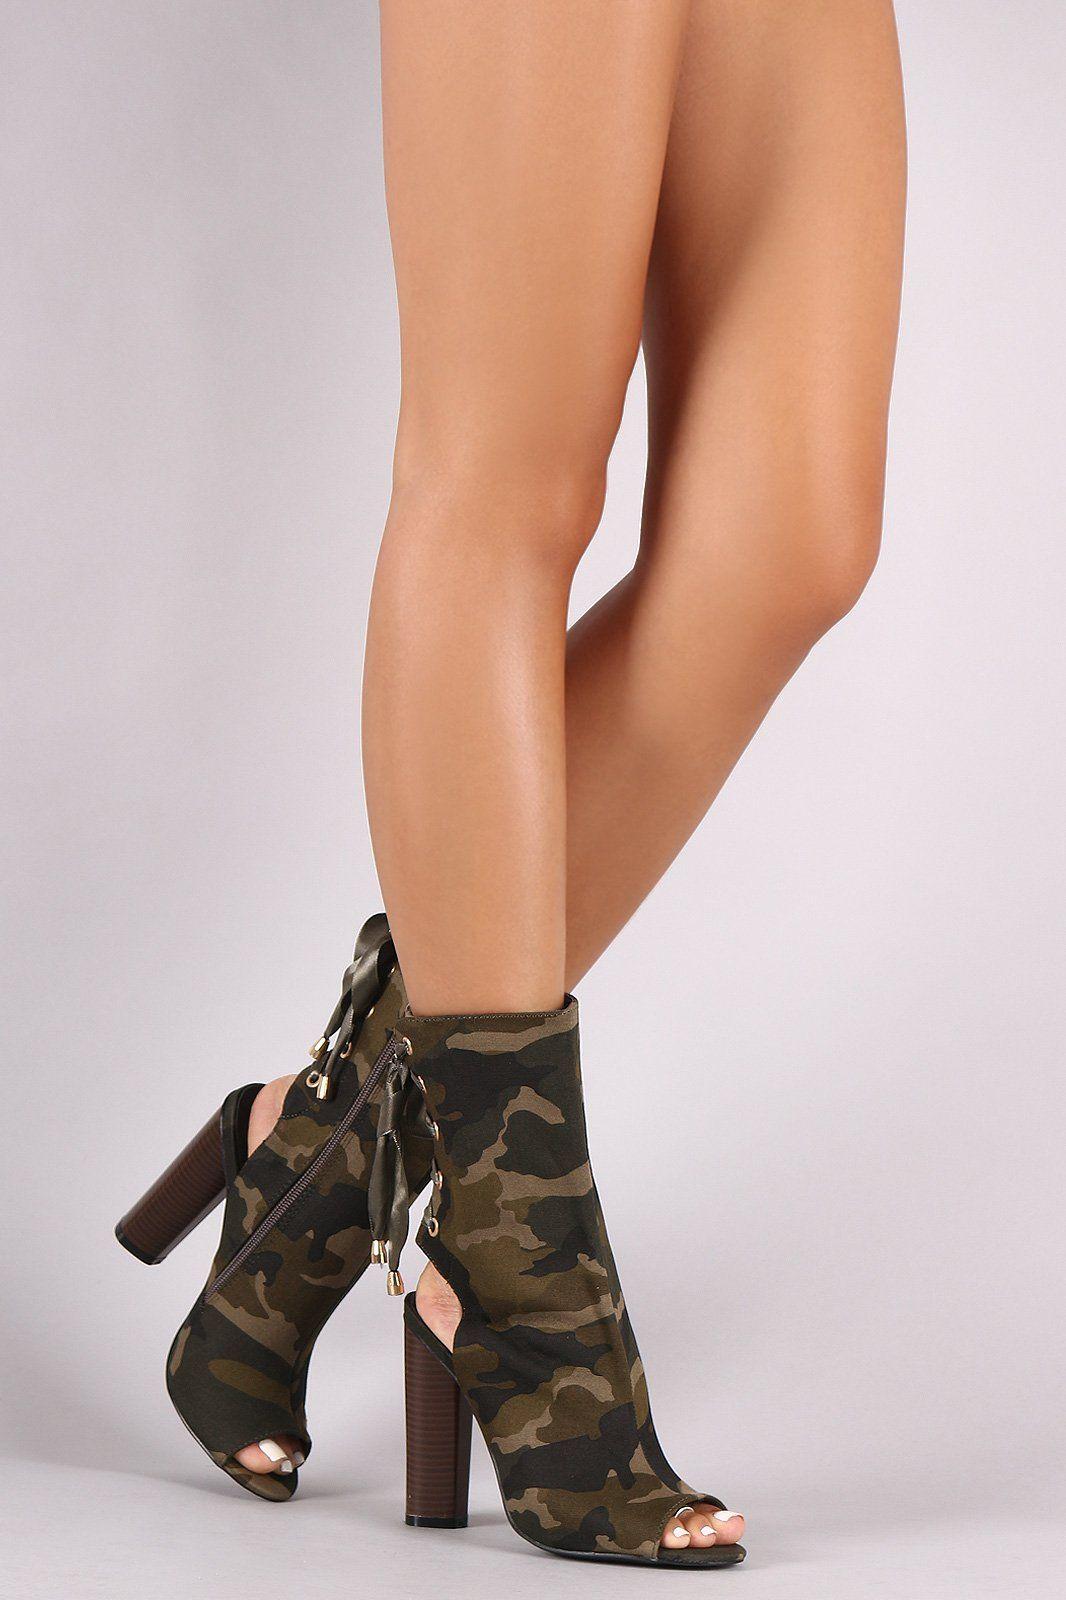 Camouflage Back Lace-Up Chunky Heeled Peep Toe Boots  9b299da060e3